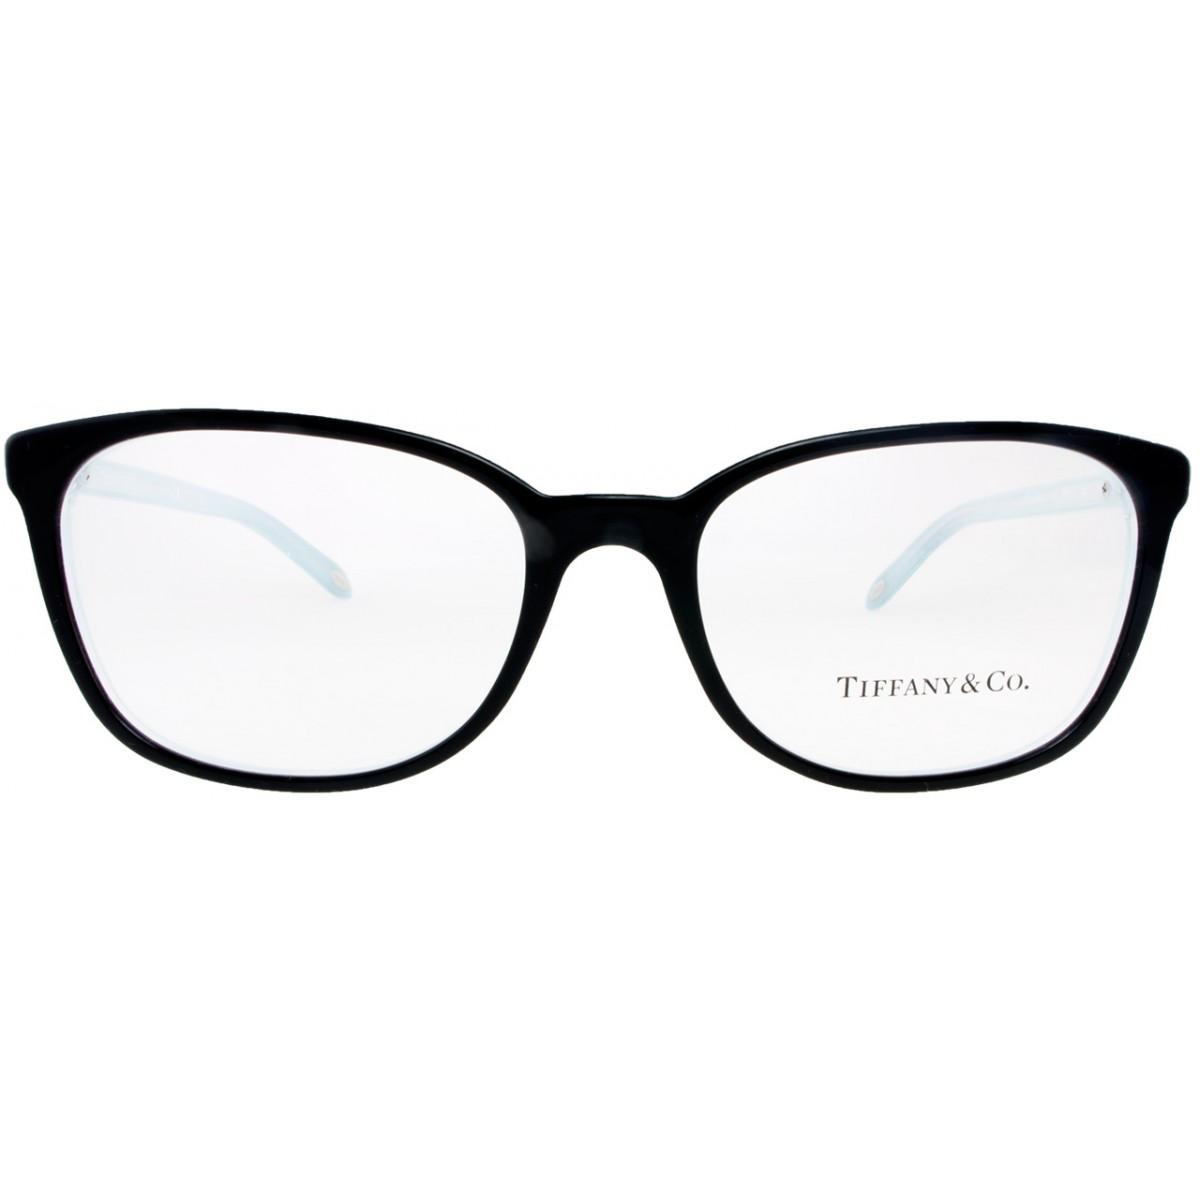 1590b451e48 Online Eyeglasses with Customer Service Center in California Tiffany ...